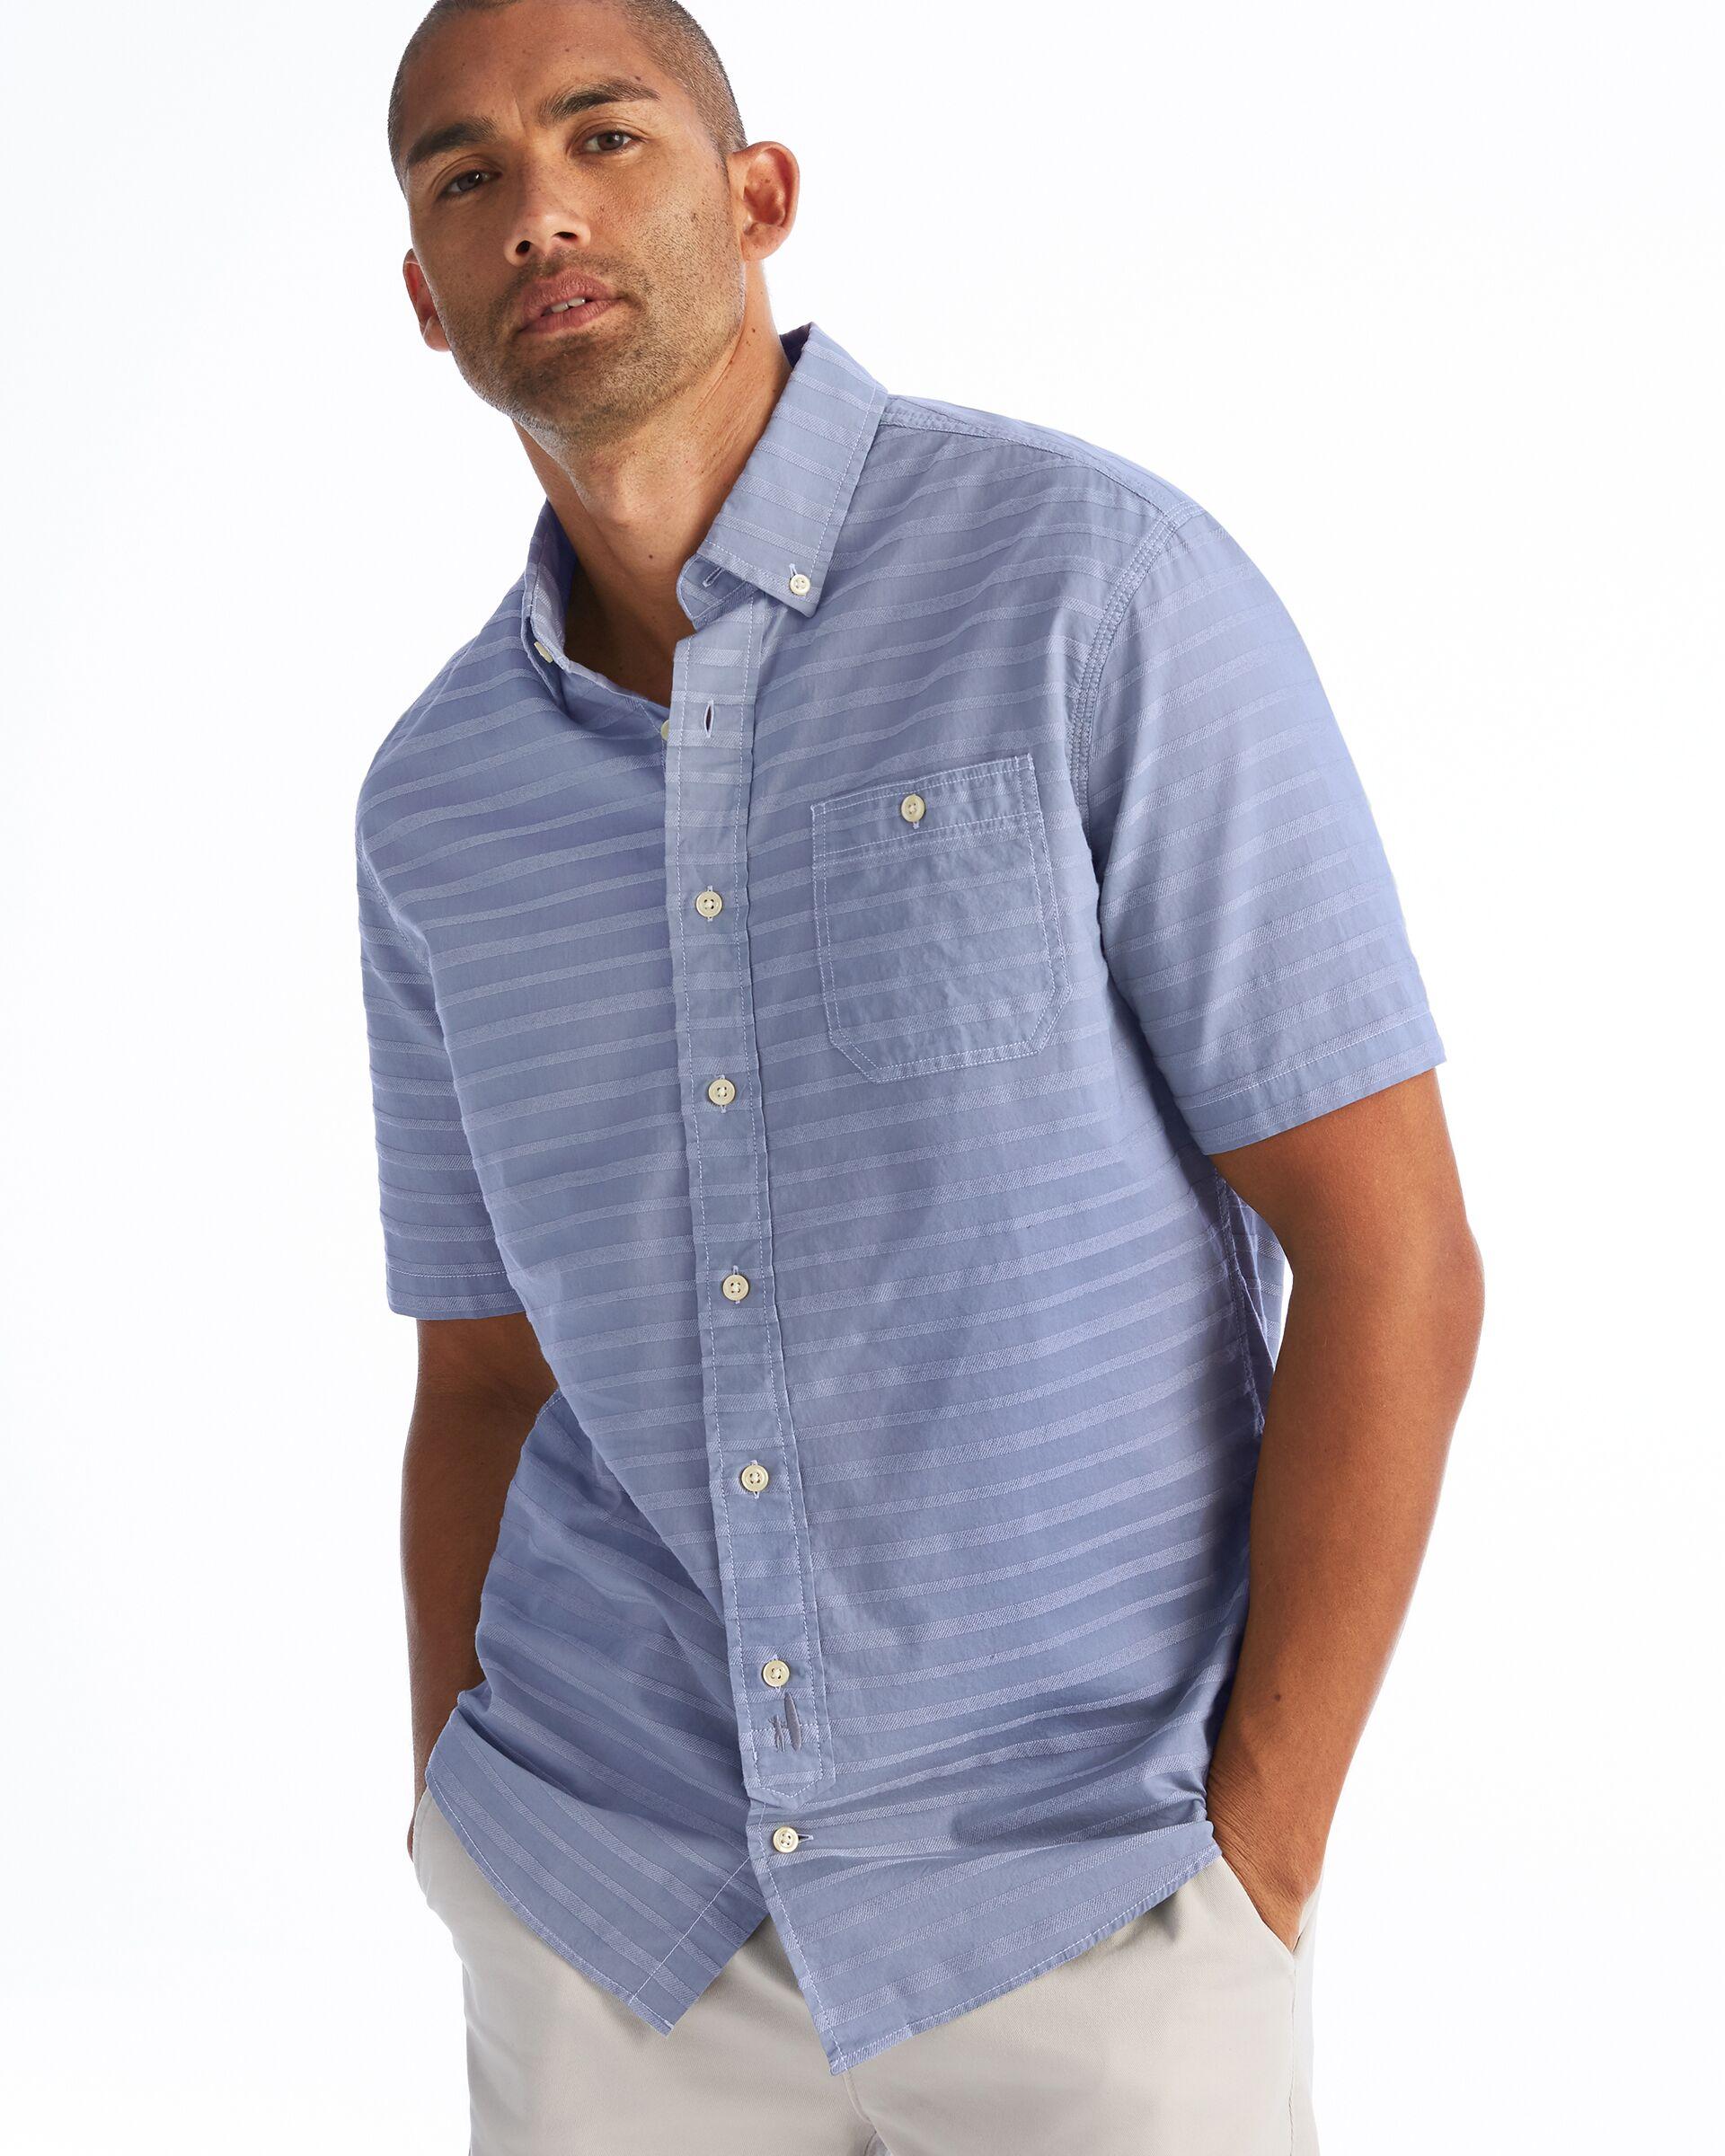 Raleigh Hangin' Out Spread Collar Short Sleeve Shirt (Marlin)